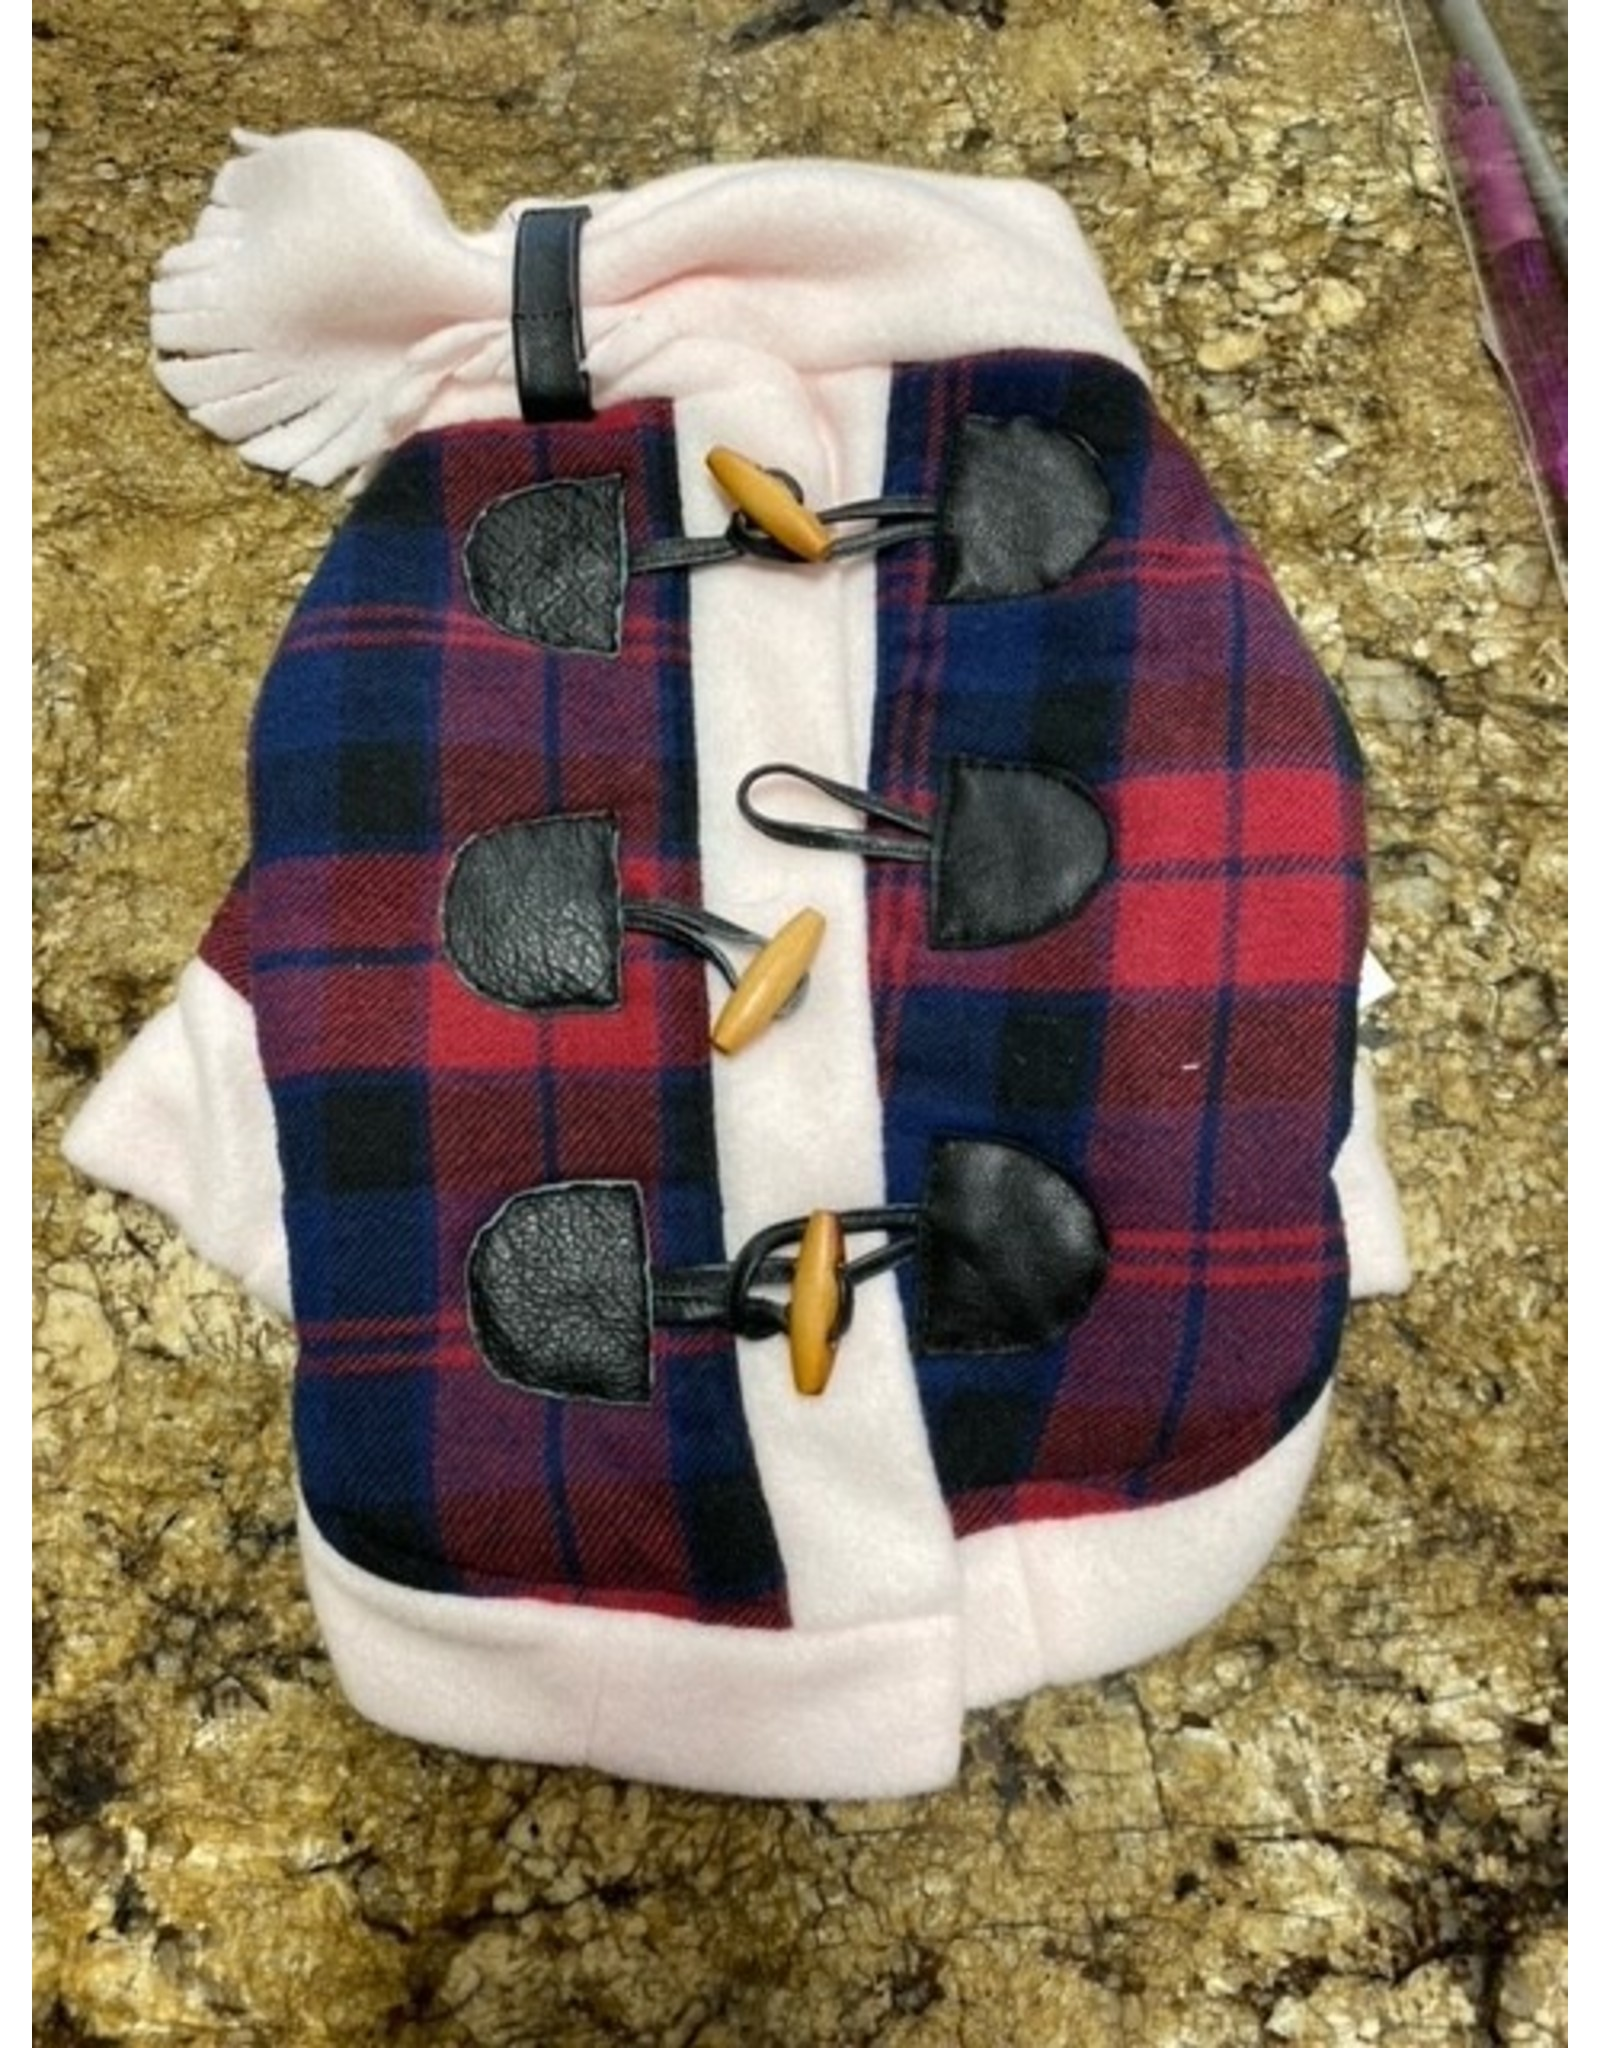 Ruff-Stitched Blue & Red Plaid Toggle Coat - Small